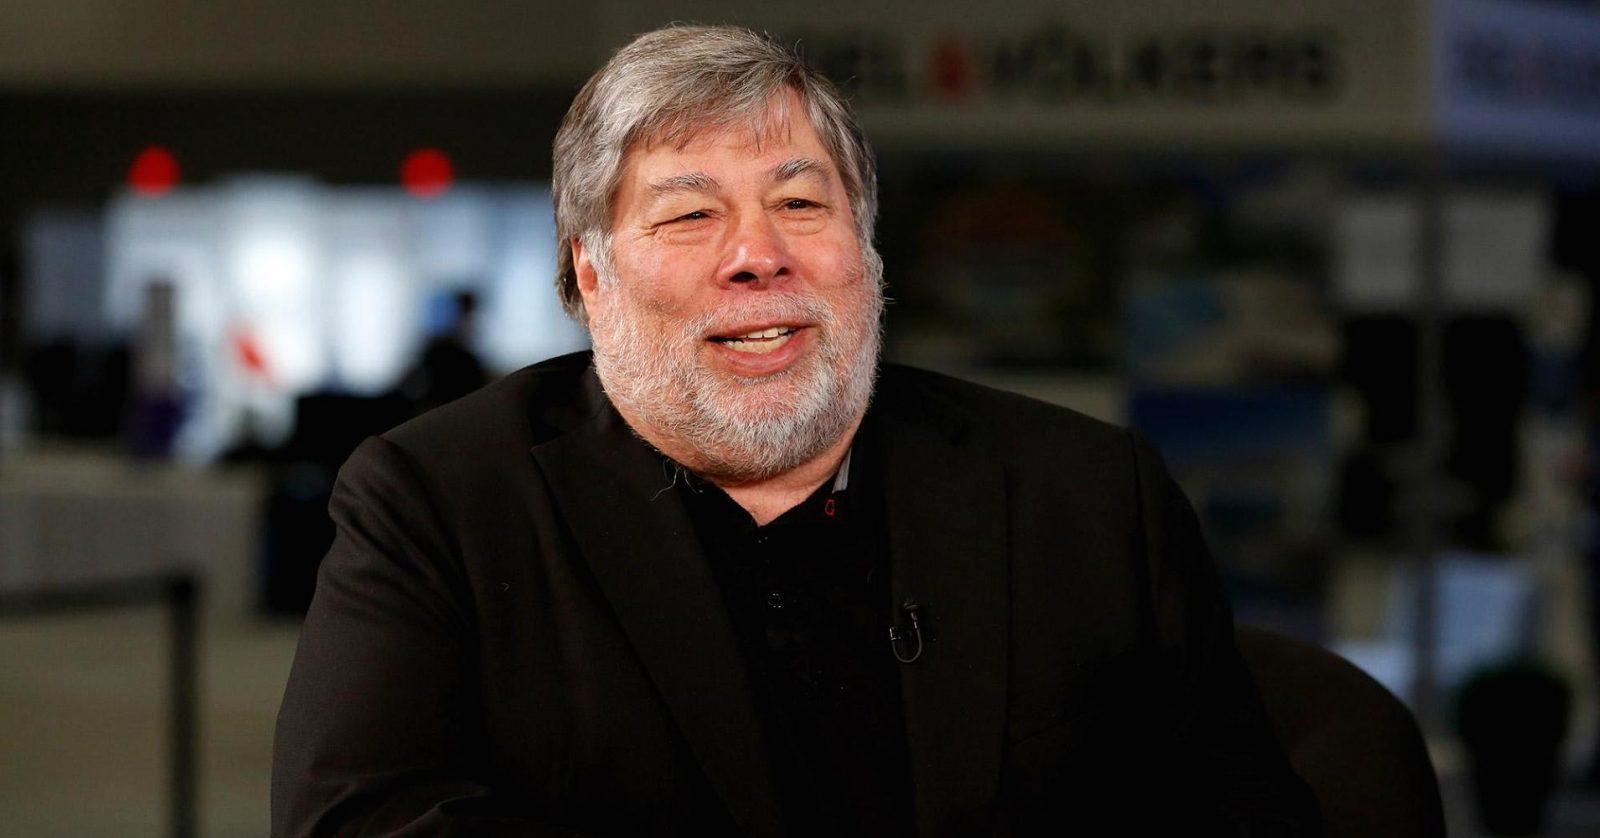 Steve Wozniak vittima di truffa con i Bitcoin - Steve Wozniak vittima di truffa con i Bitcoin: perde $ 70K in una transazione